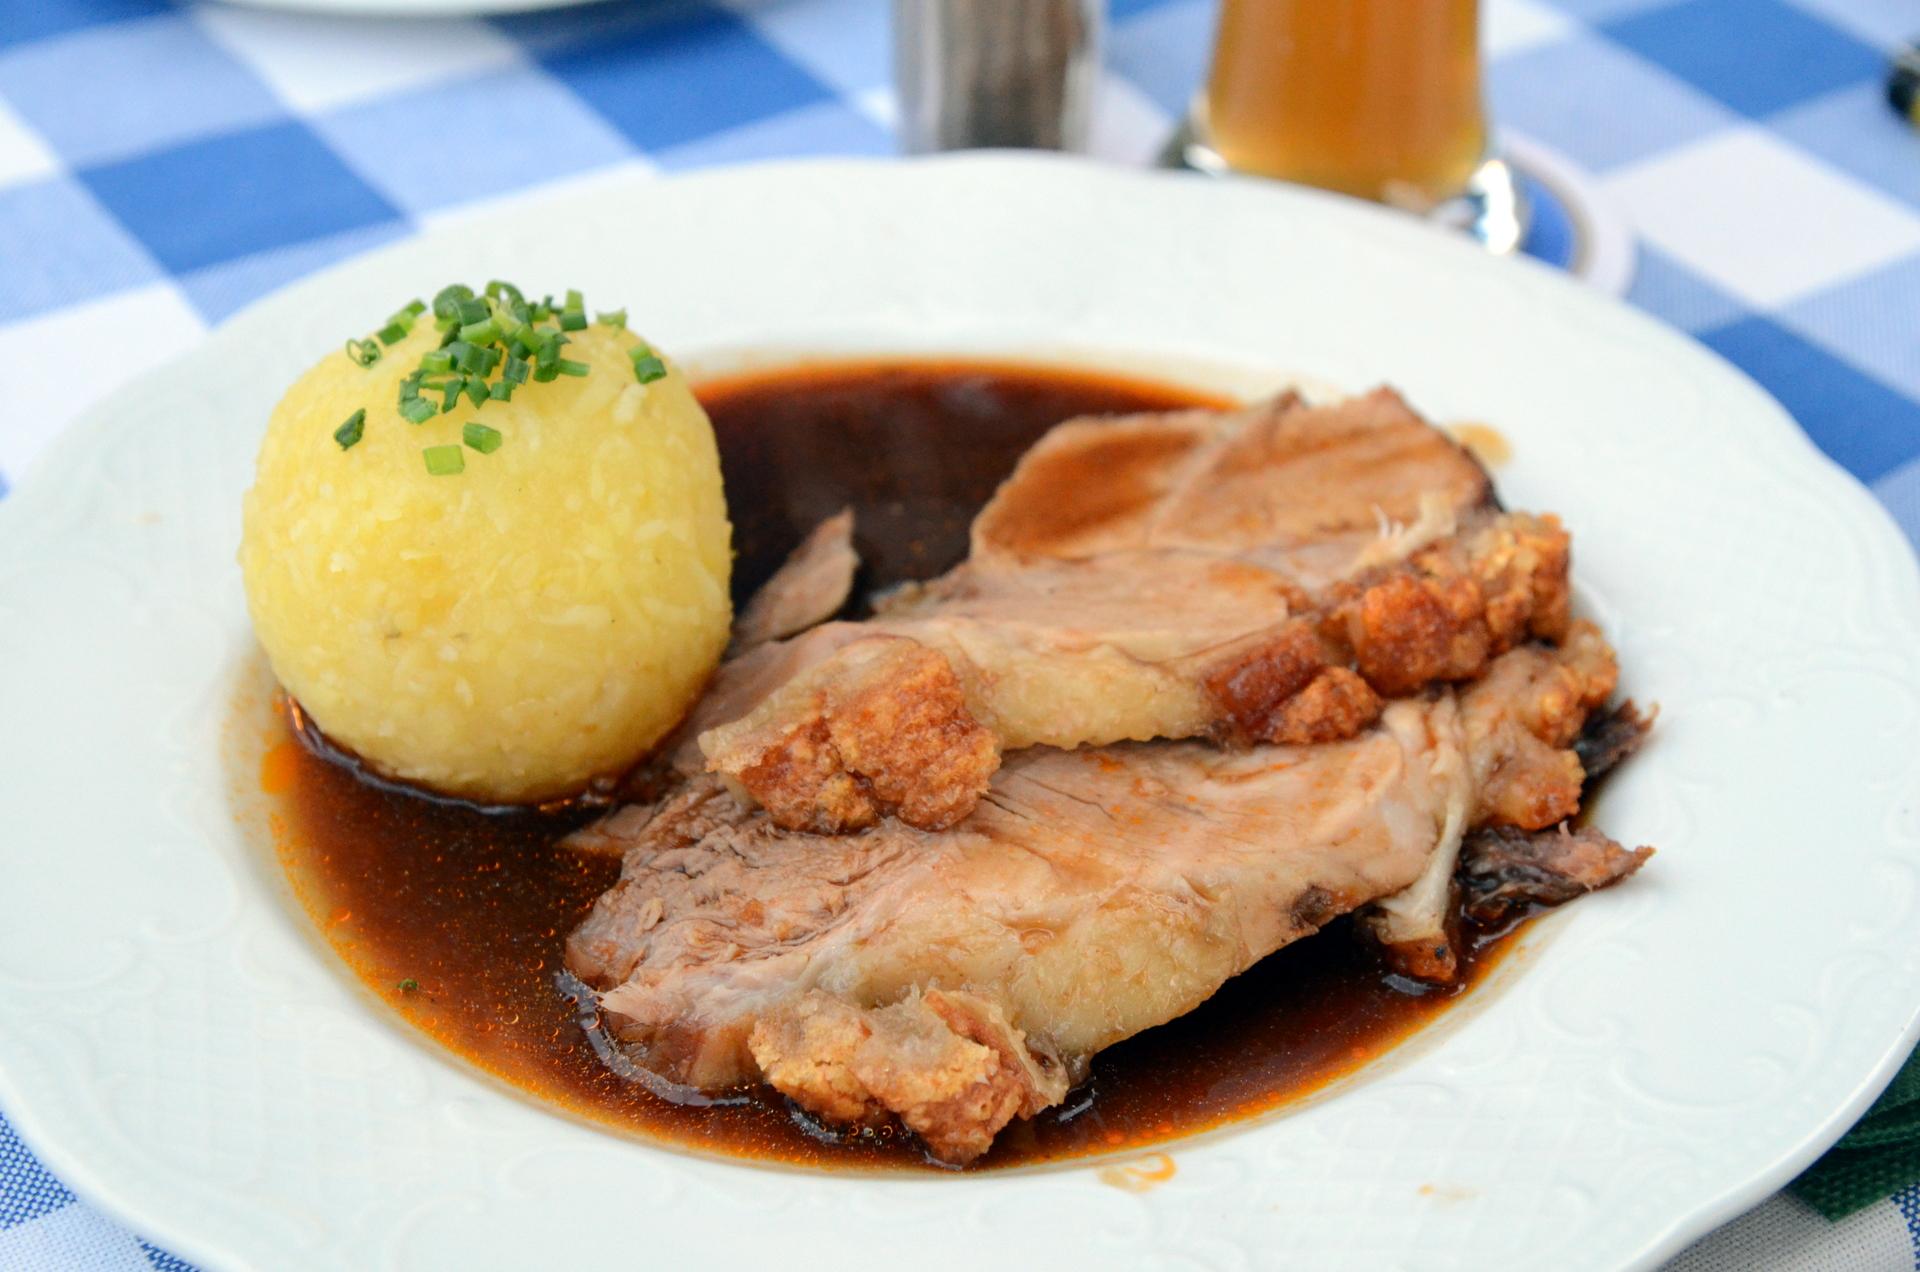 File 2011 0628 seefeld schweinsbraten mit kartoffelkn del for Cucina norvegese